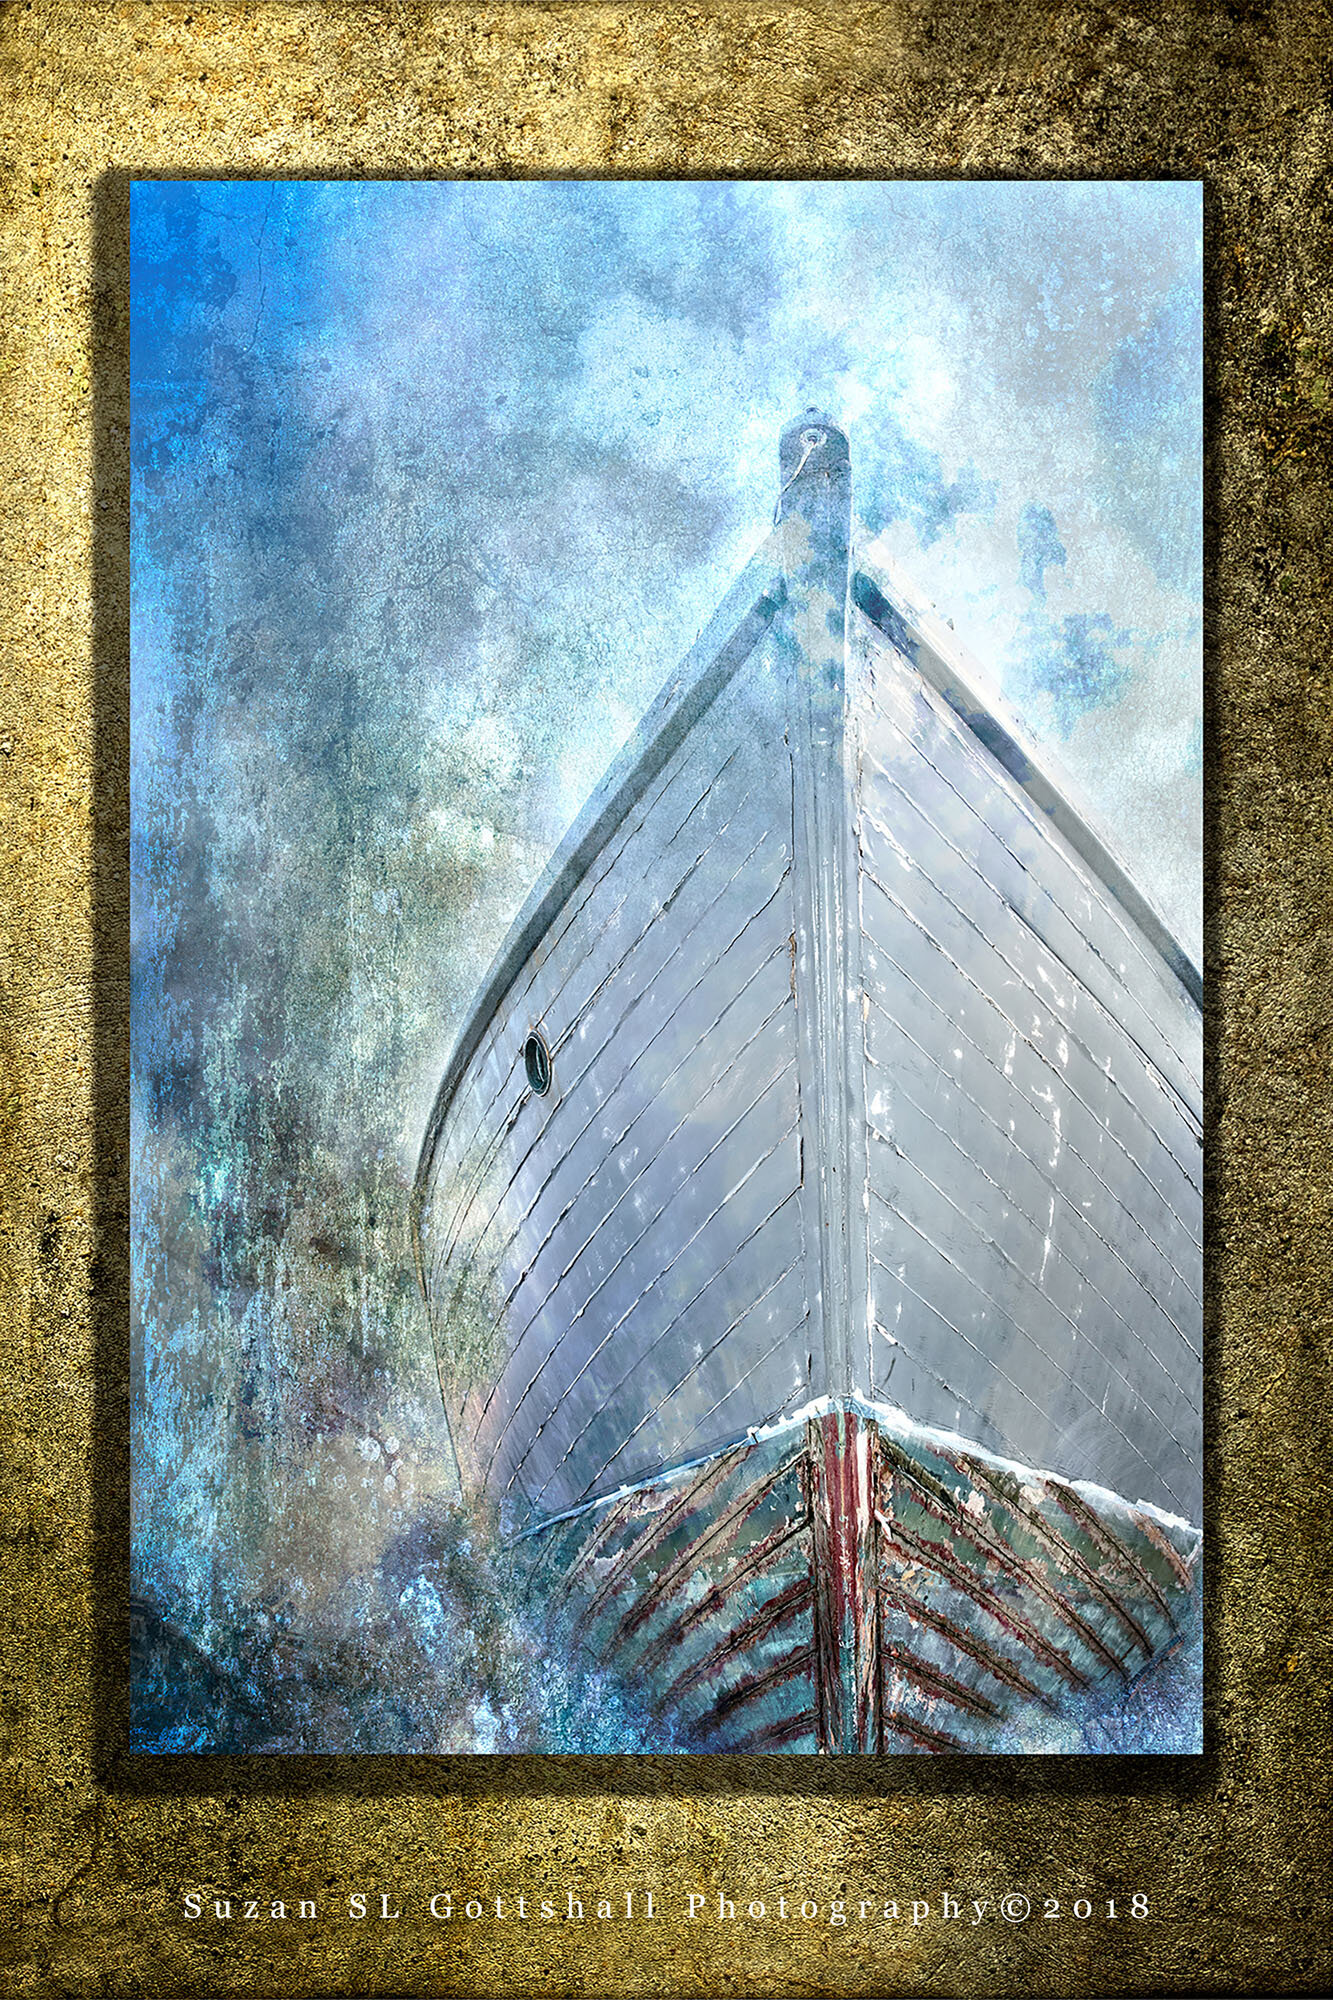 ws_3painting_wooden_boat_suzanslgottshall_adobe.jpg